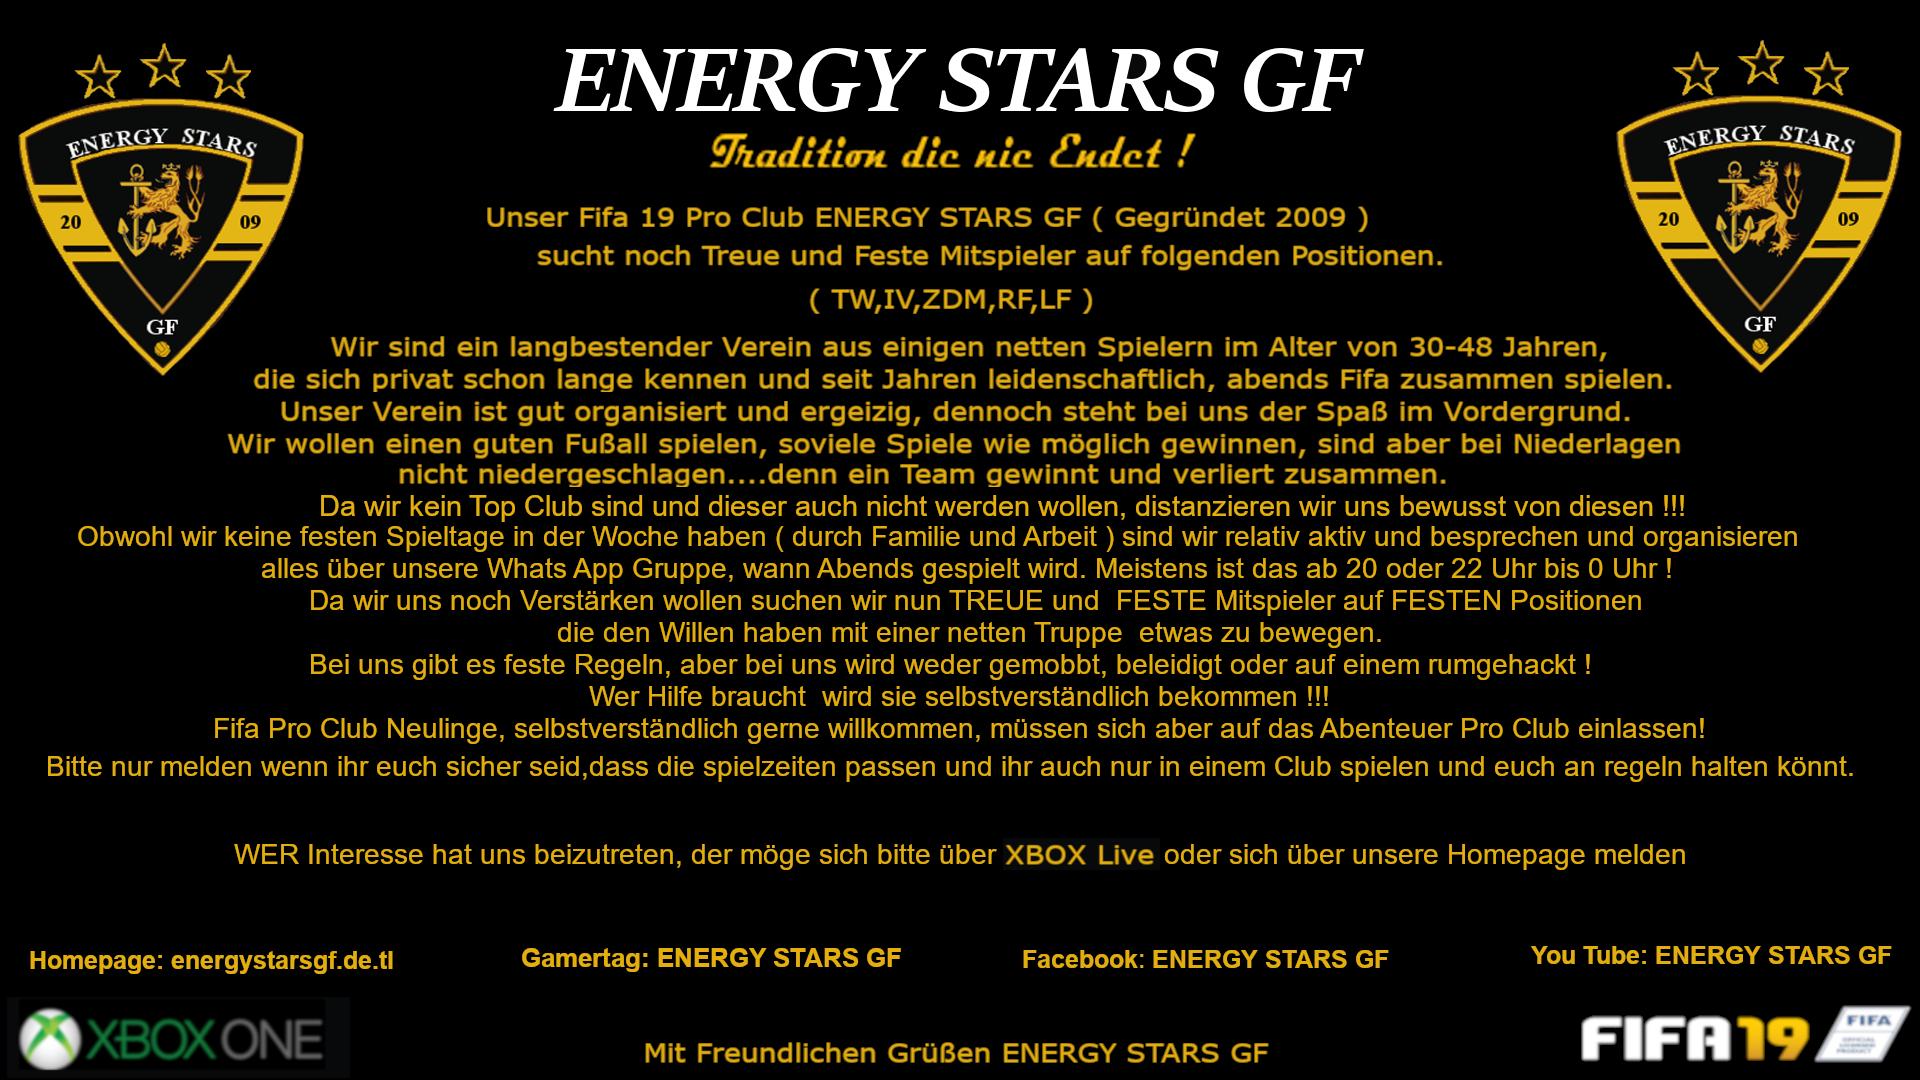 [Bild: ENERGY%20STARS%20GF%20FIFA%2019%20XBOX%2...CHE%20.png]